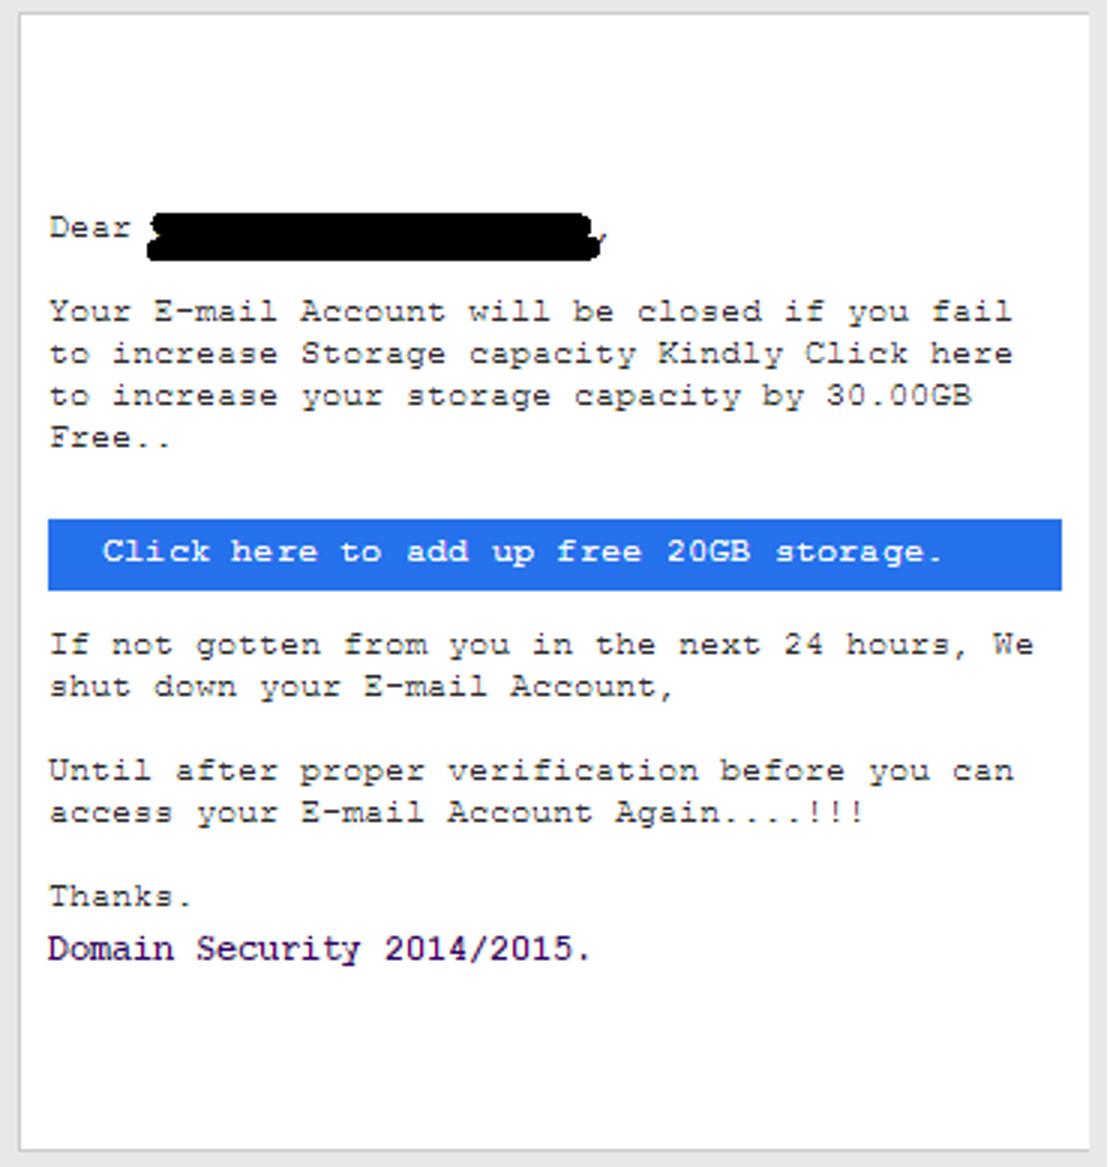 MailShark Upgrade mailbox phishing email states